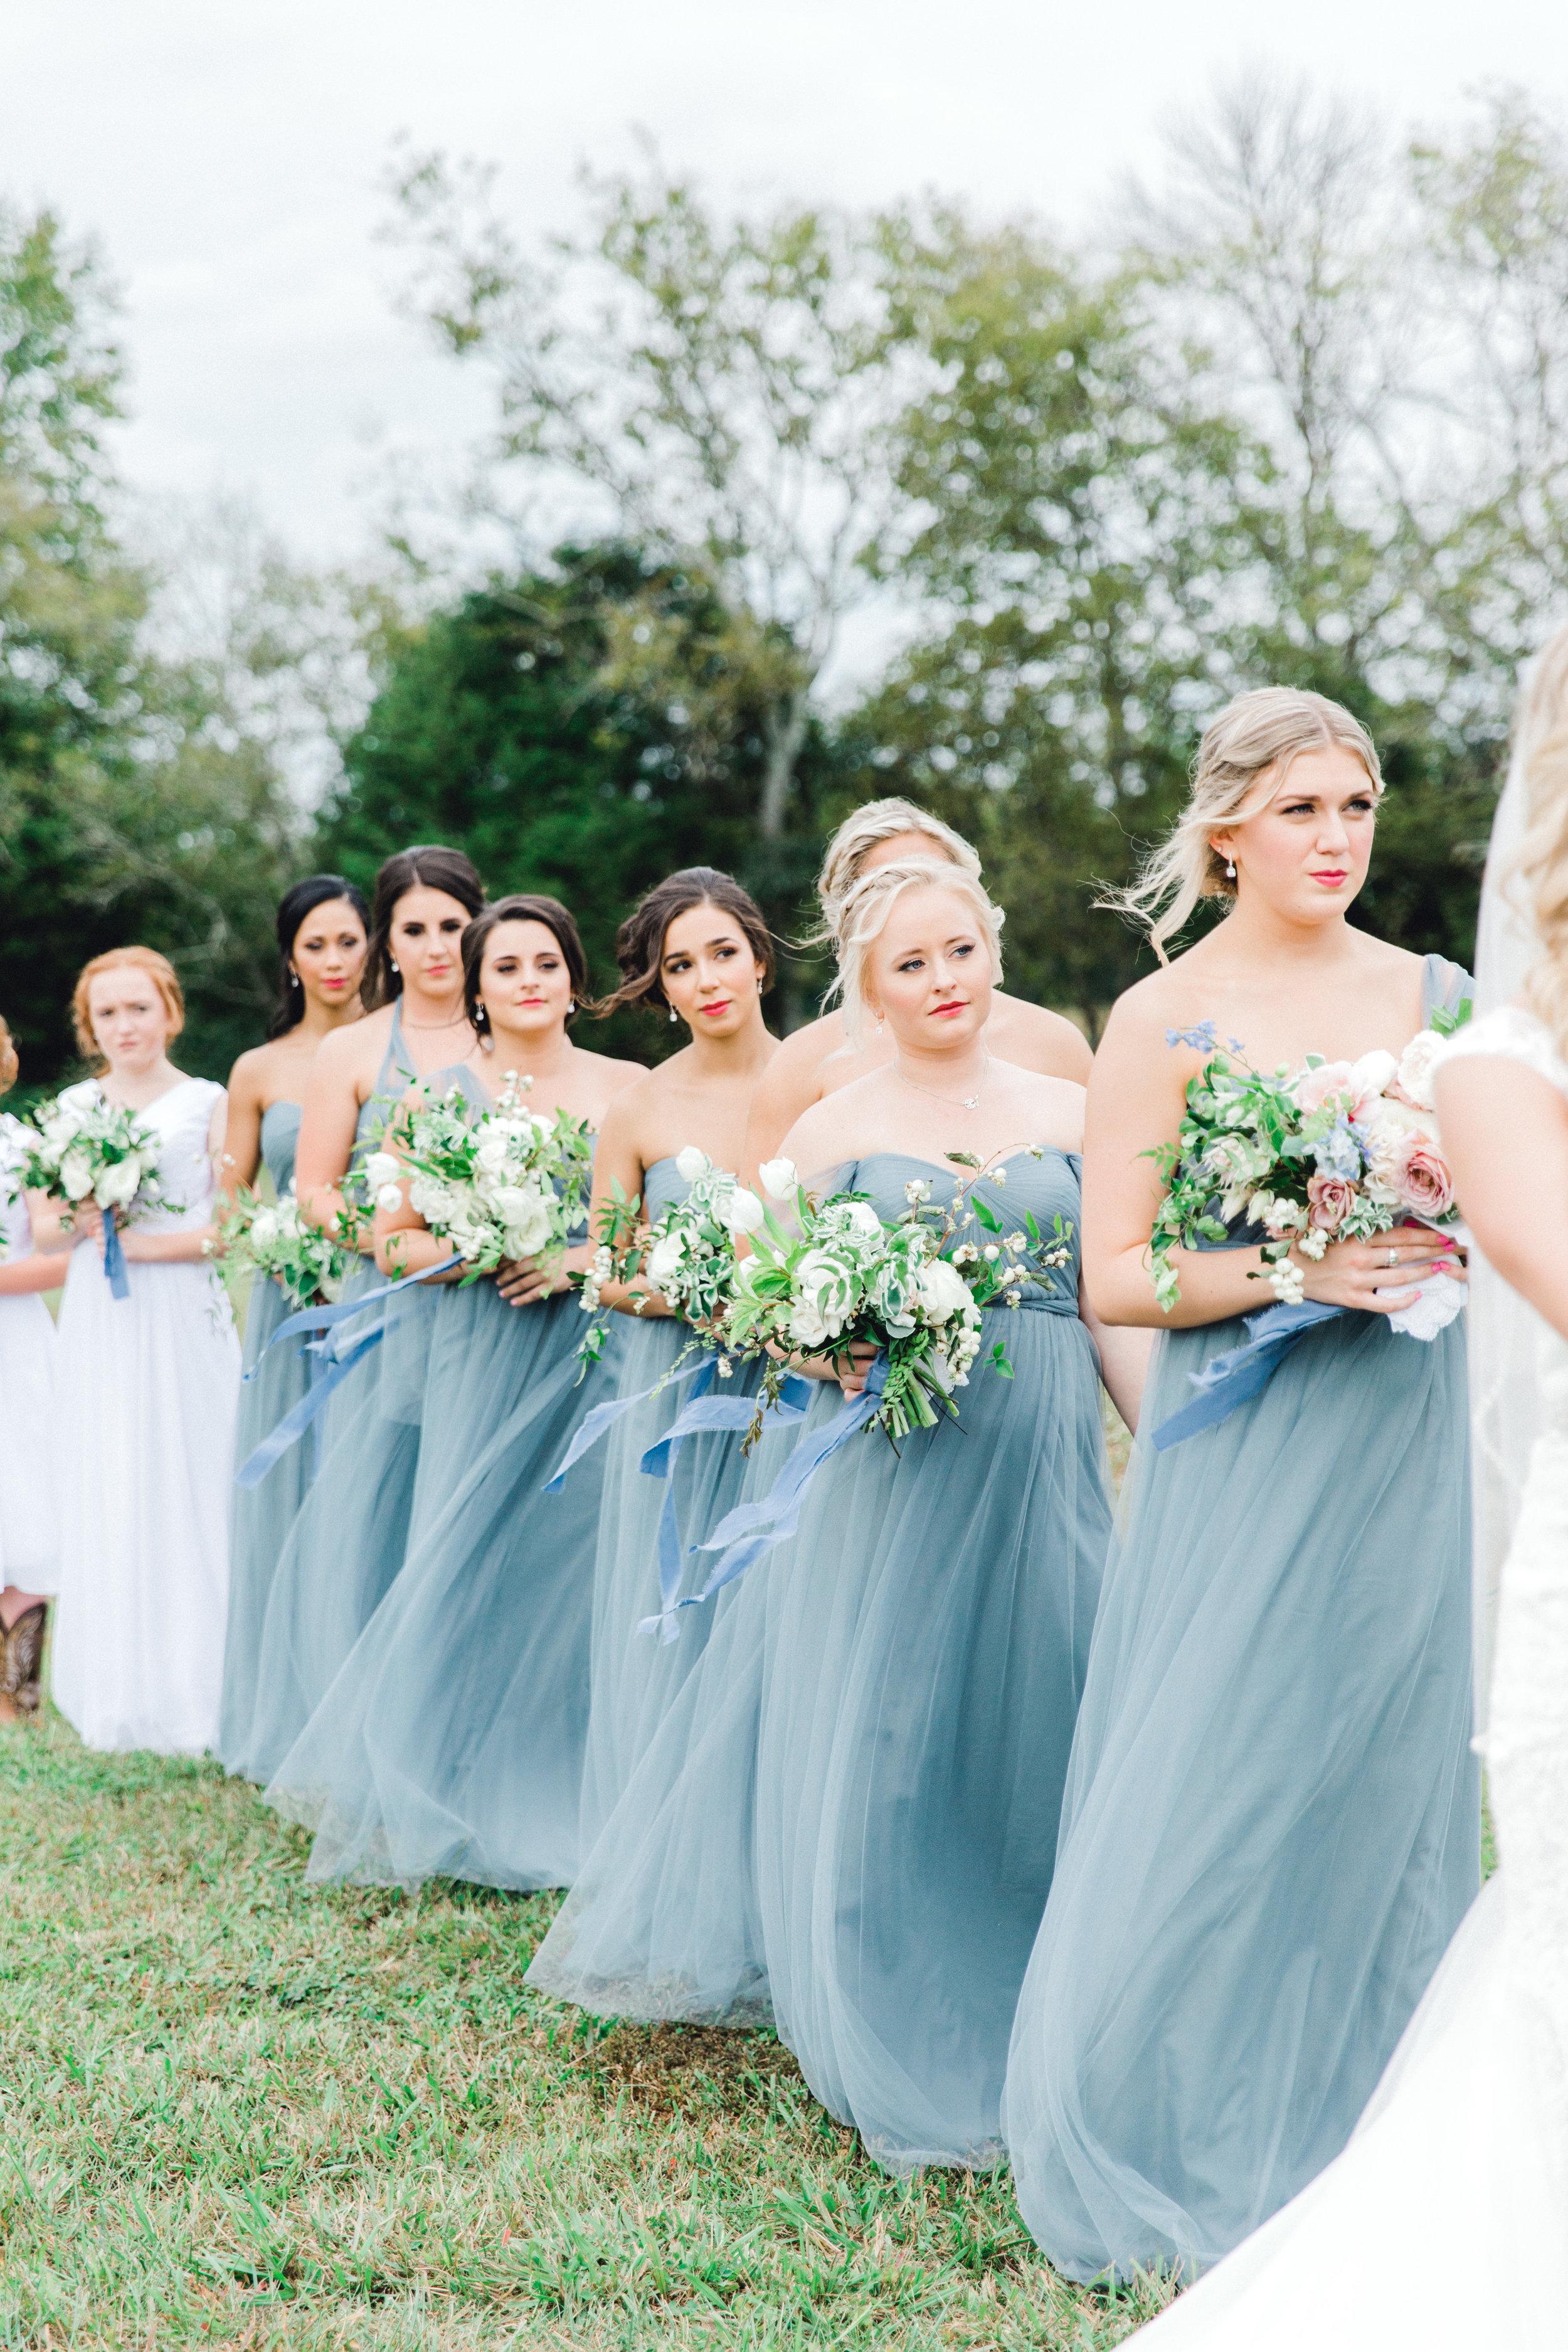 Paige-Mercer-Photography-Florida-Wedding-Photographer-Alyssa&Drew-48.jpg